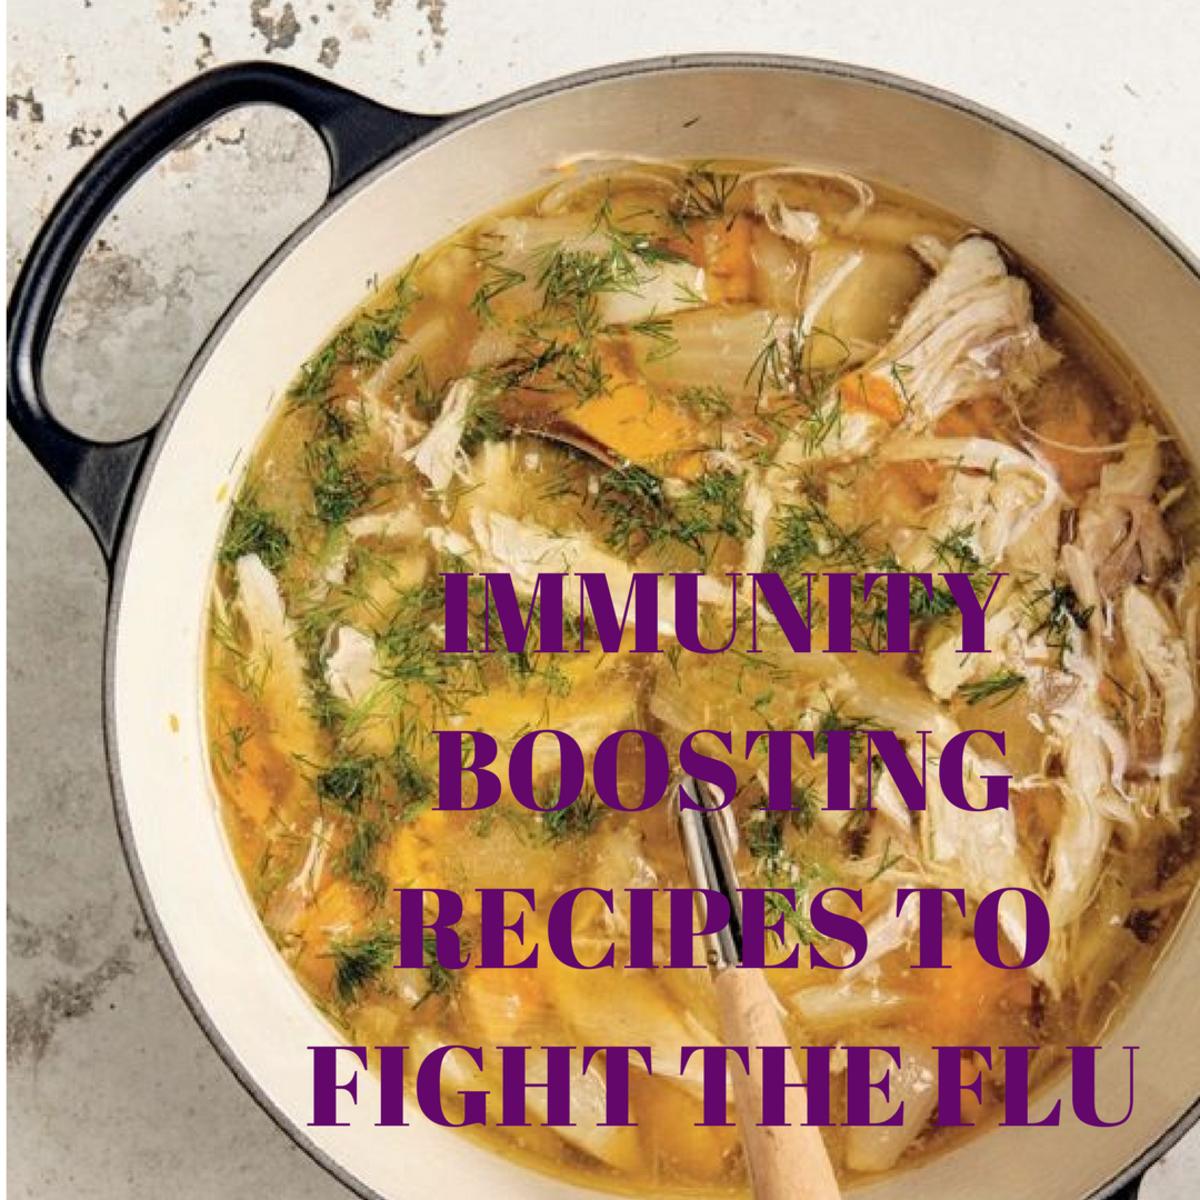 IMMUNITY BOOSTING RECIPES TO FIGHT THE FLU